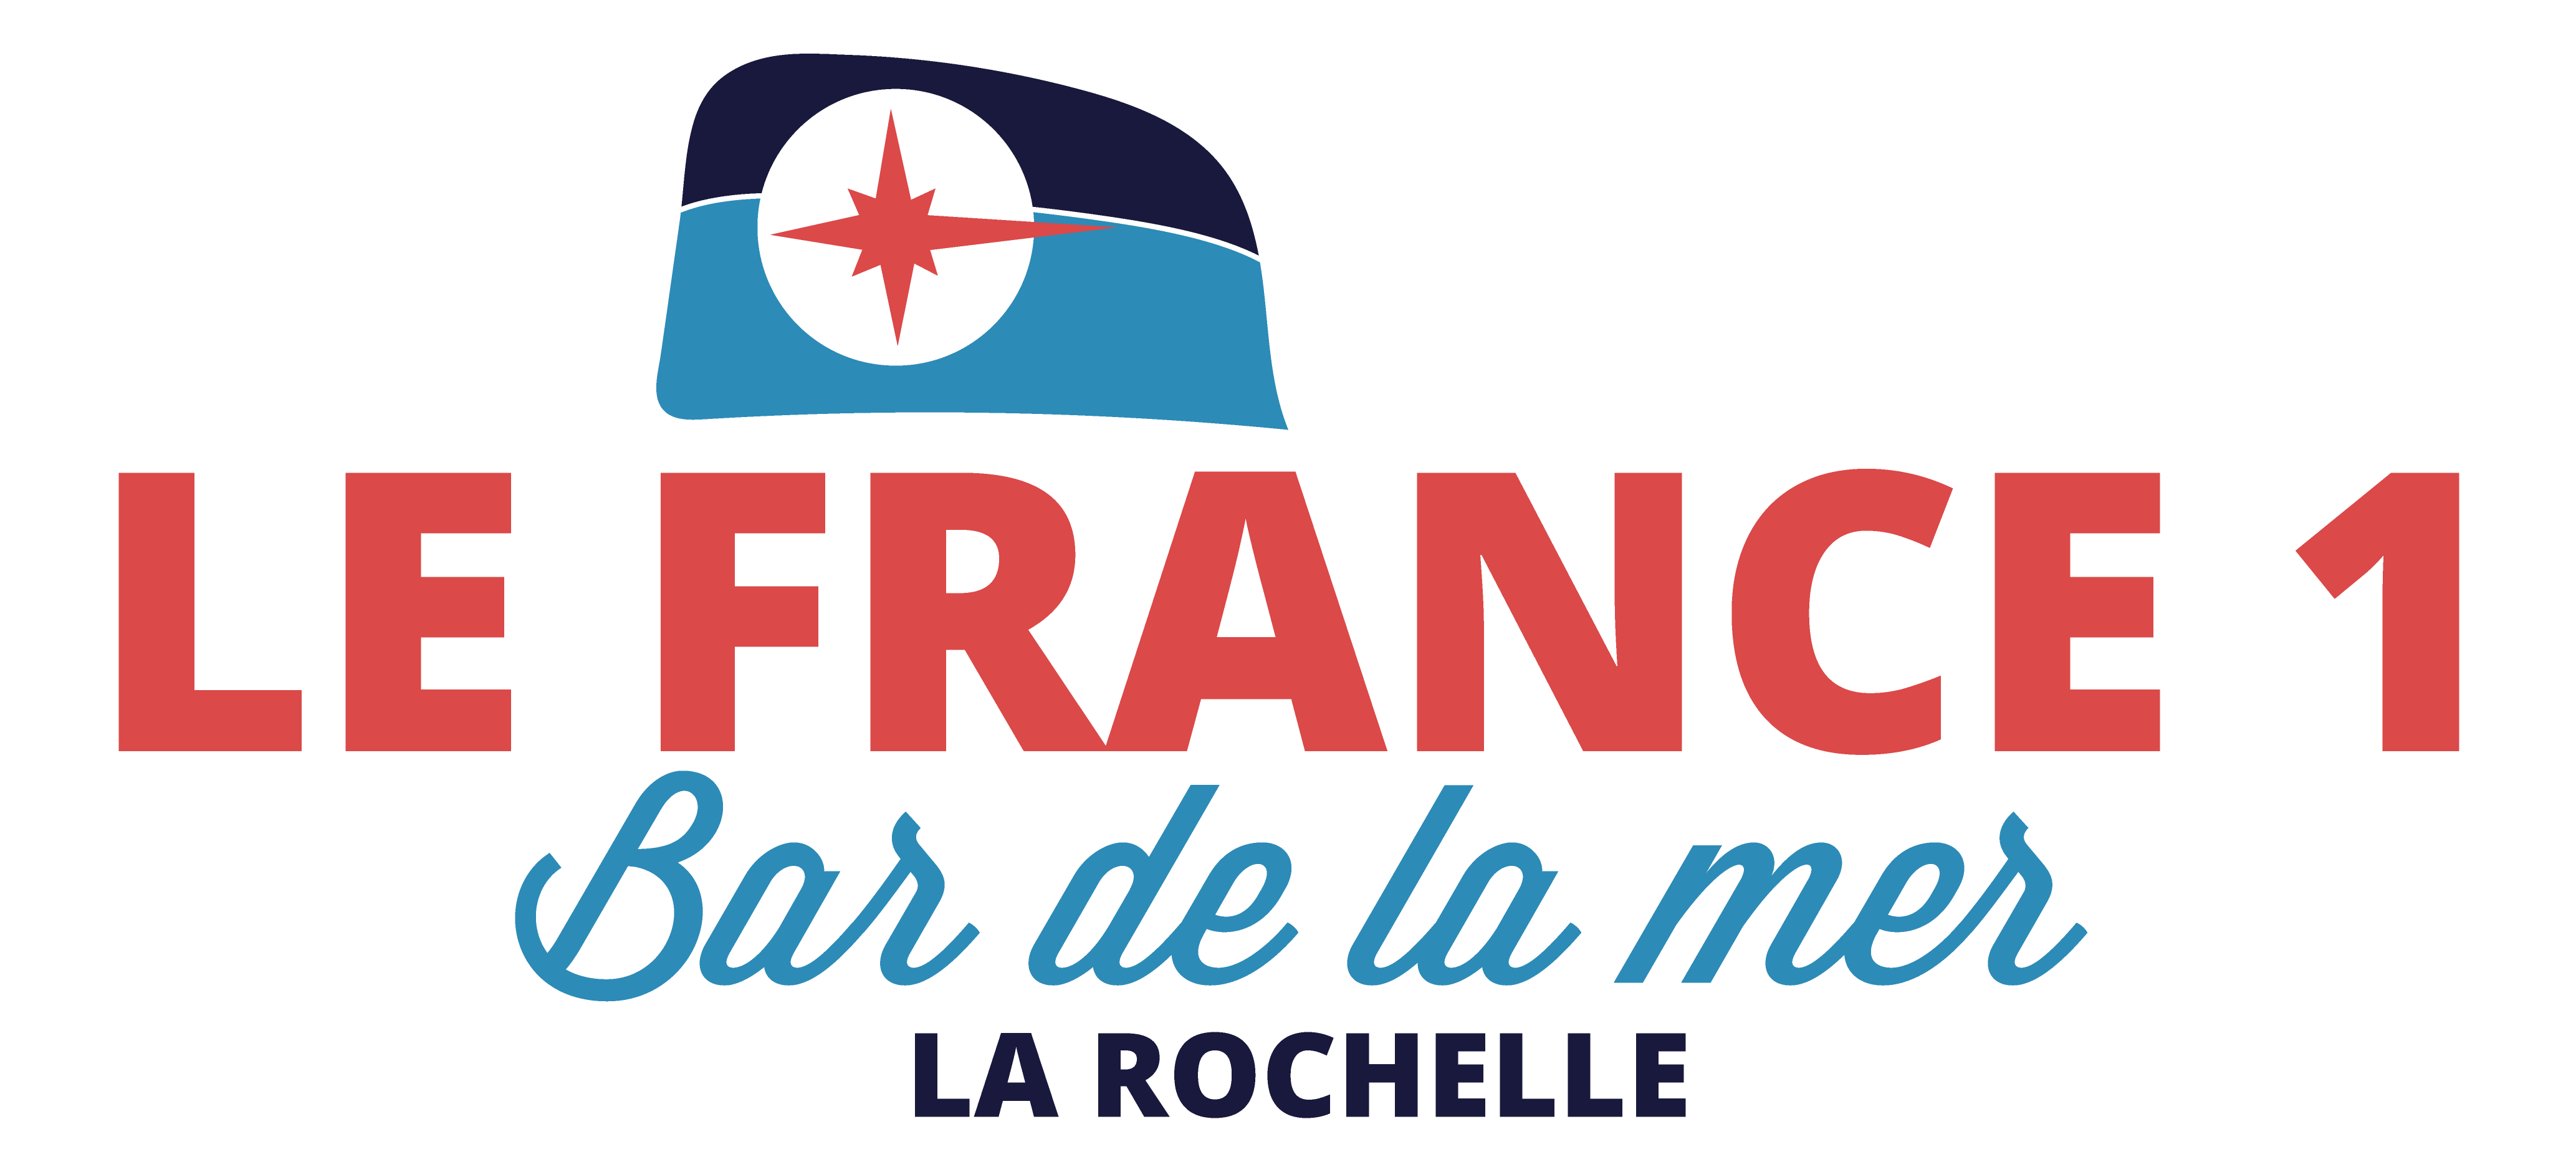 Le France 1